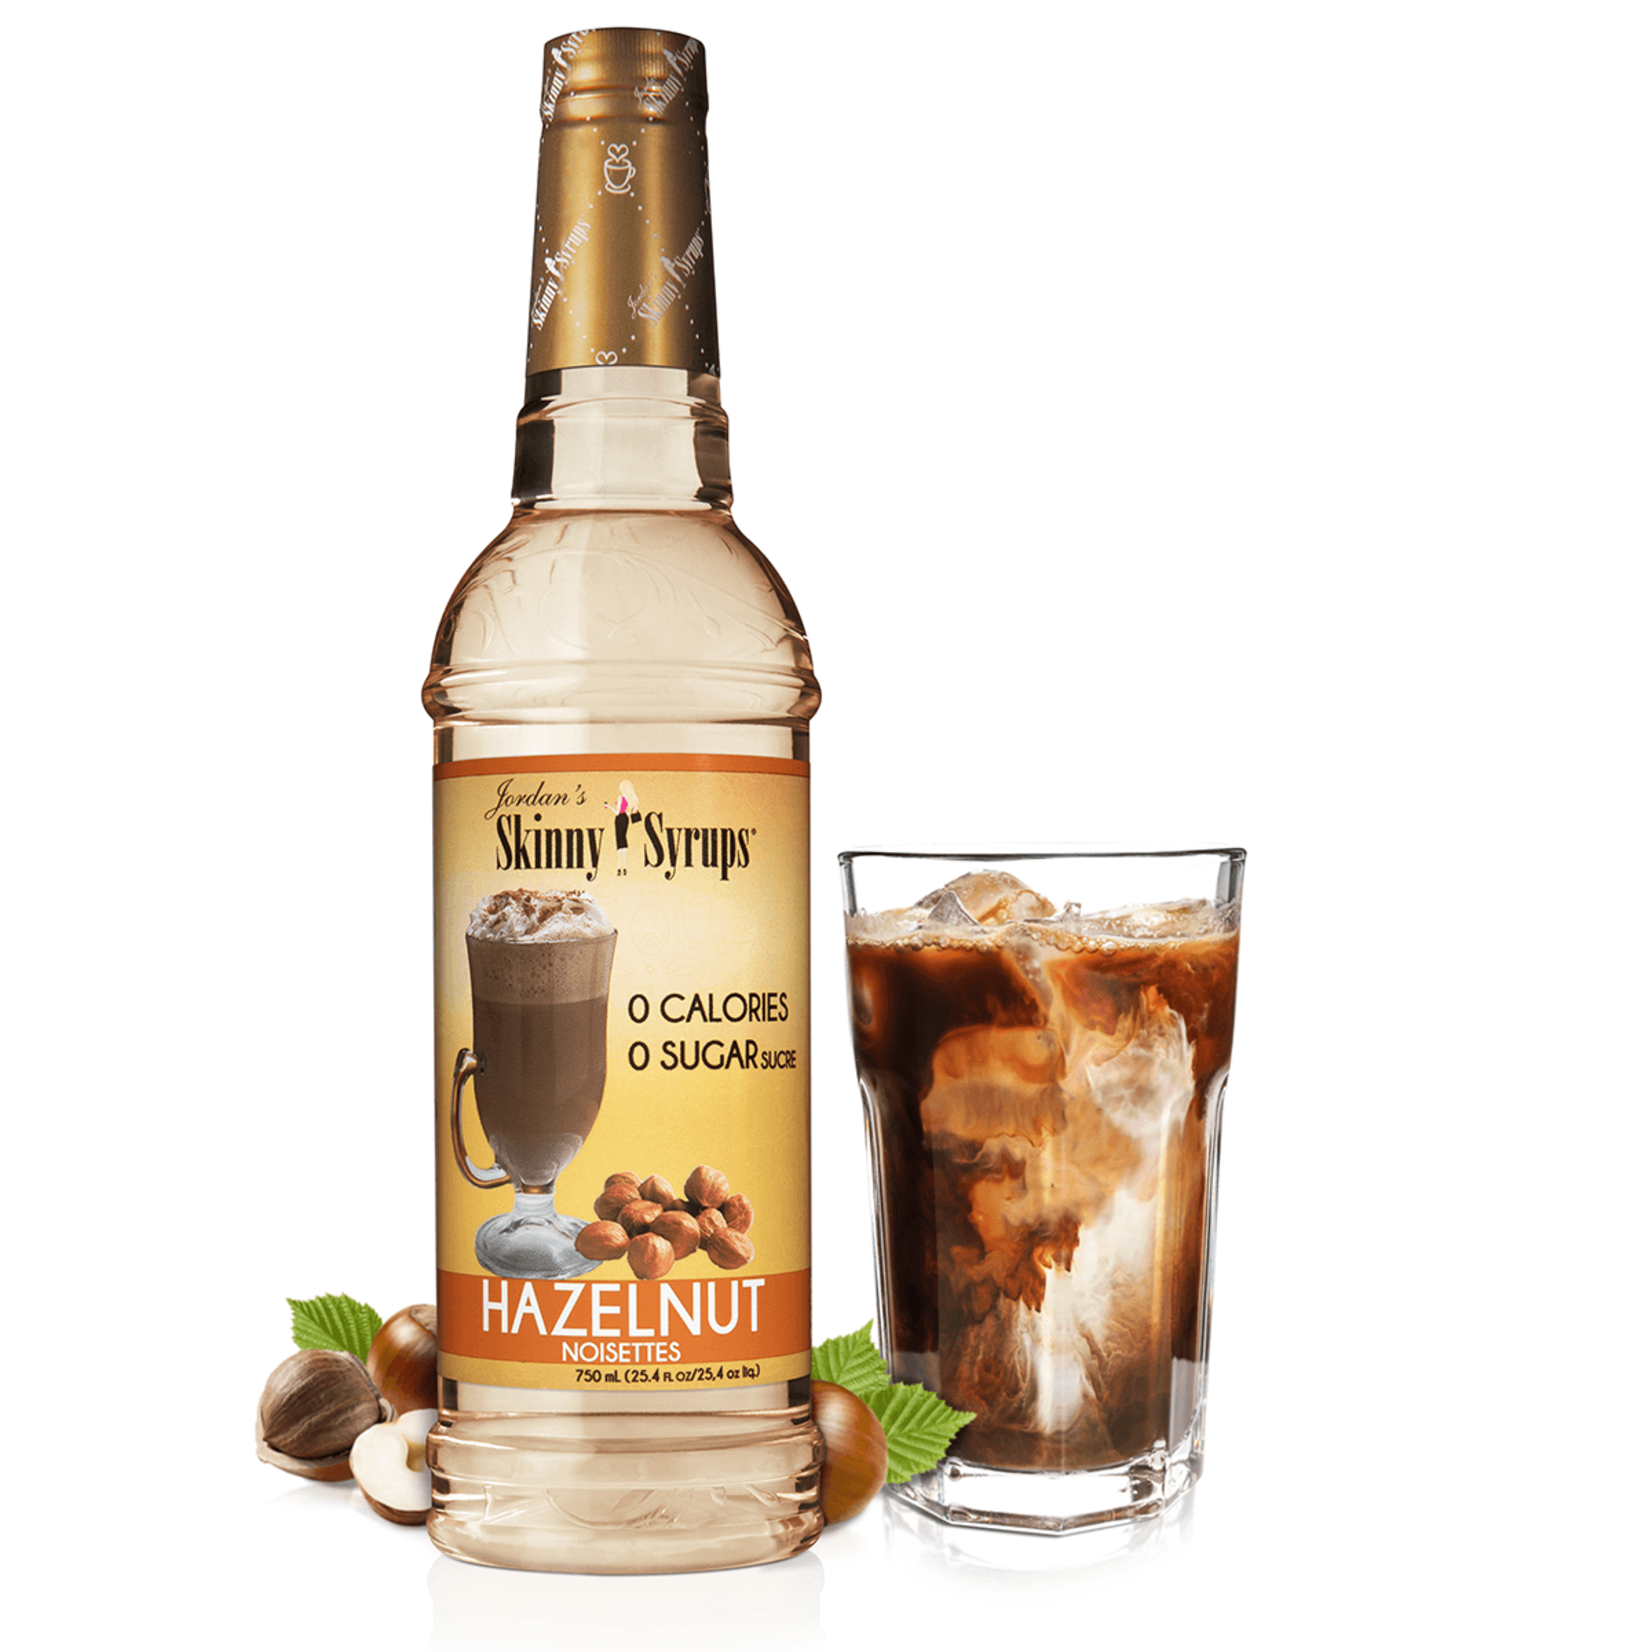 Jordan's Skinny Mixes Sugar Free Hazelnut Syrup